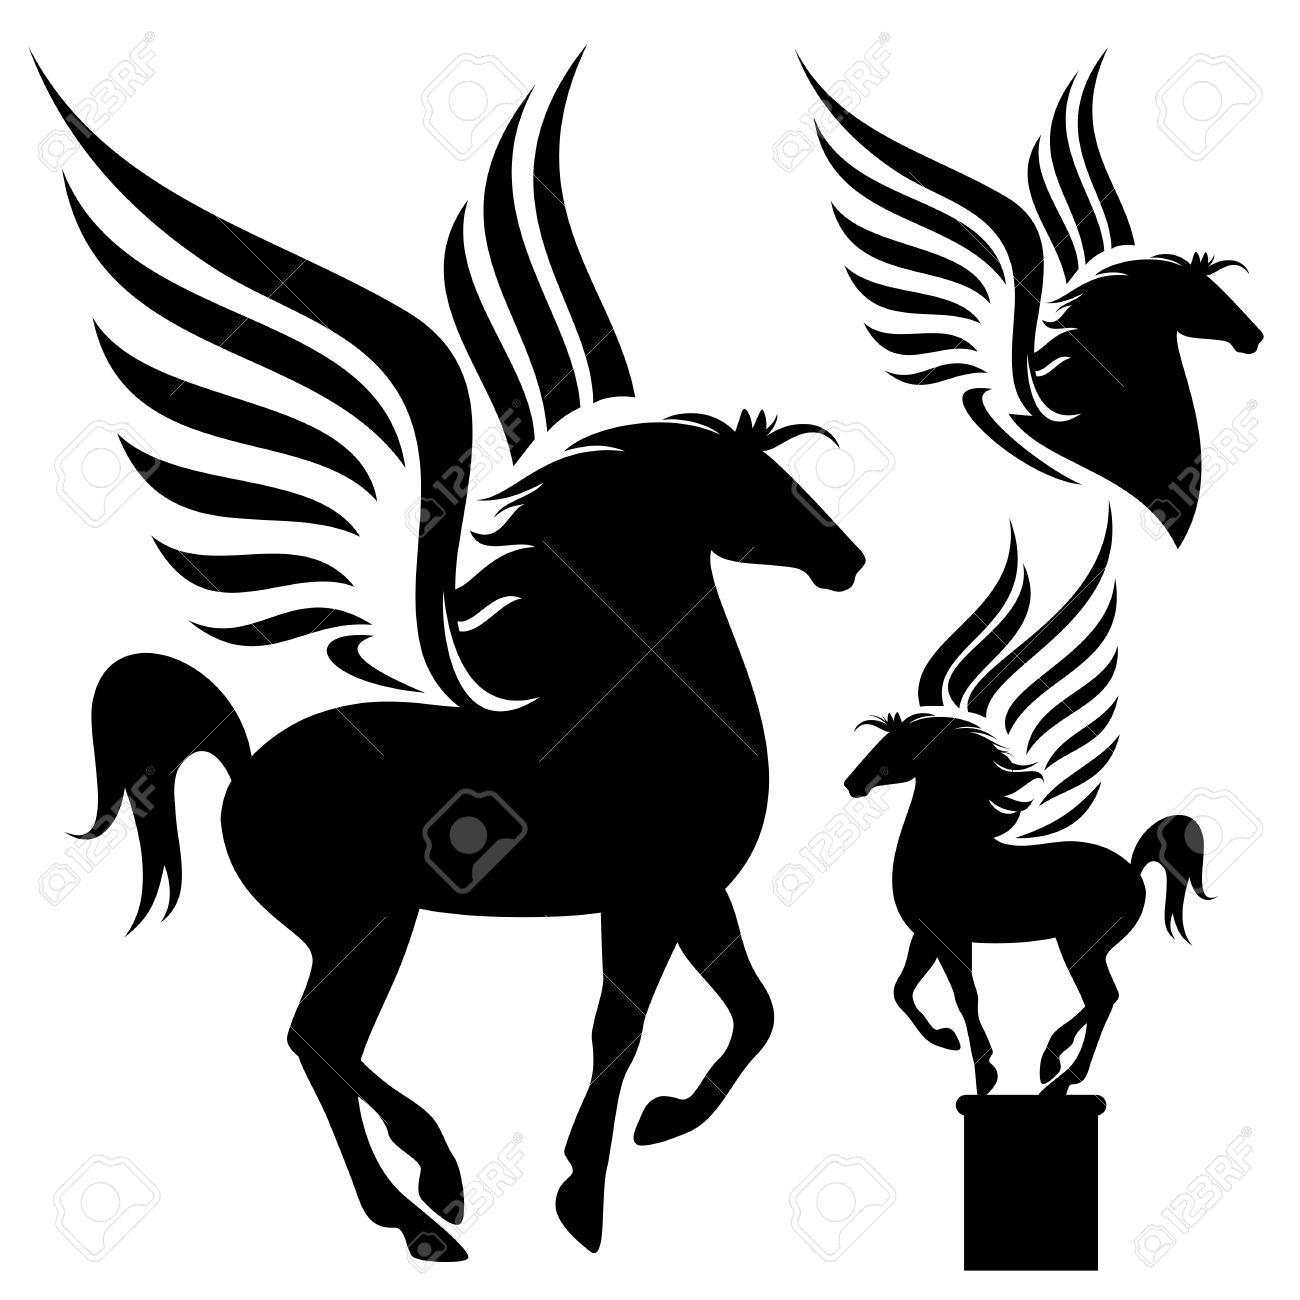 pegasus silhouette set - black winged horses on white - 27447263